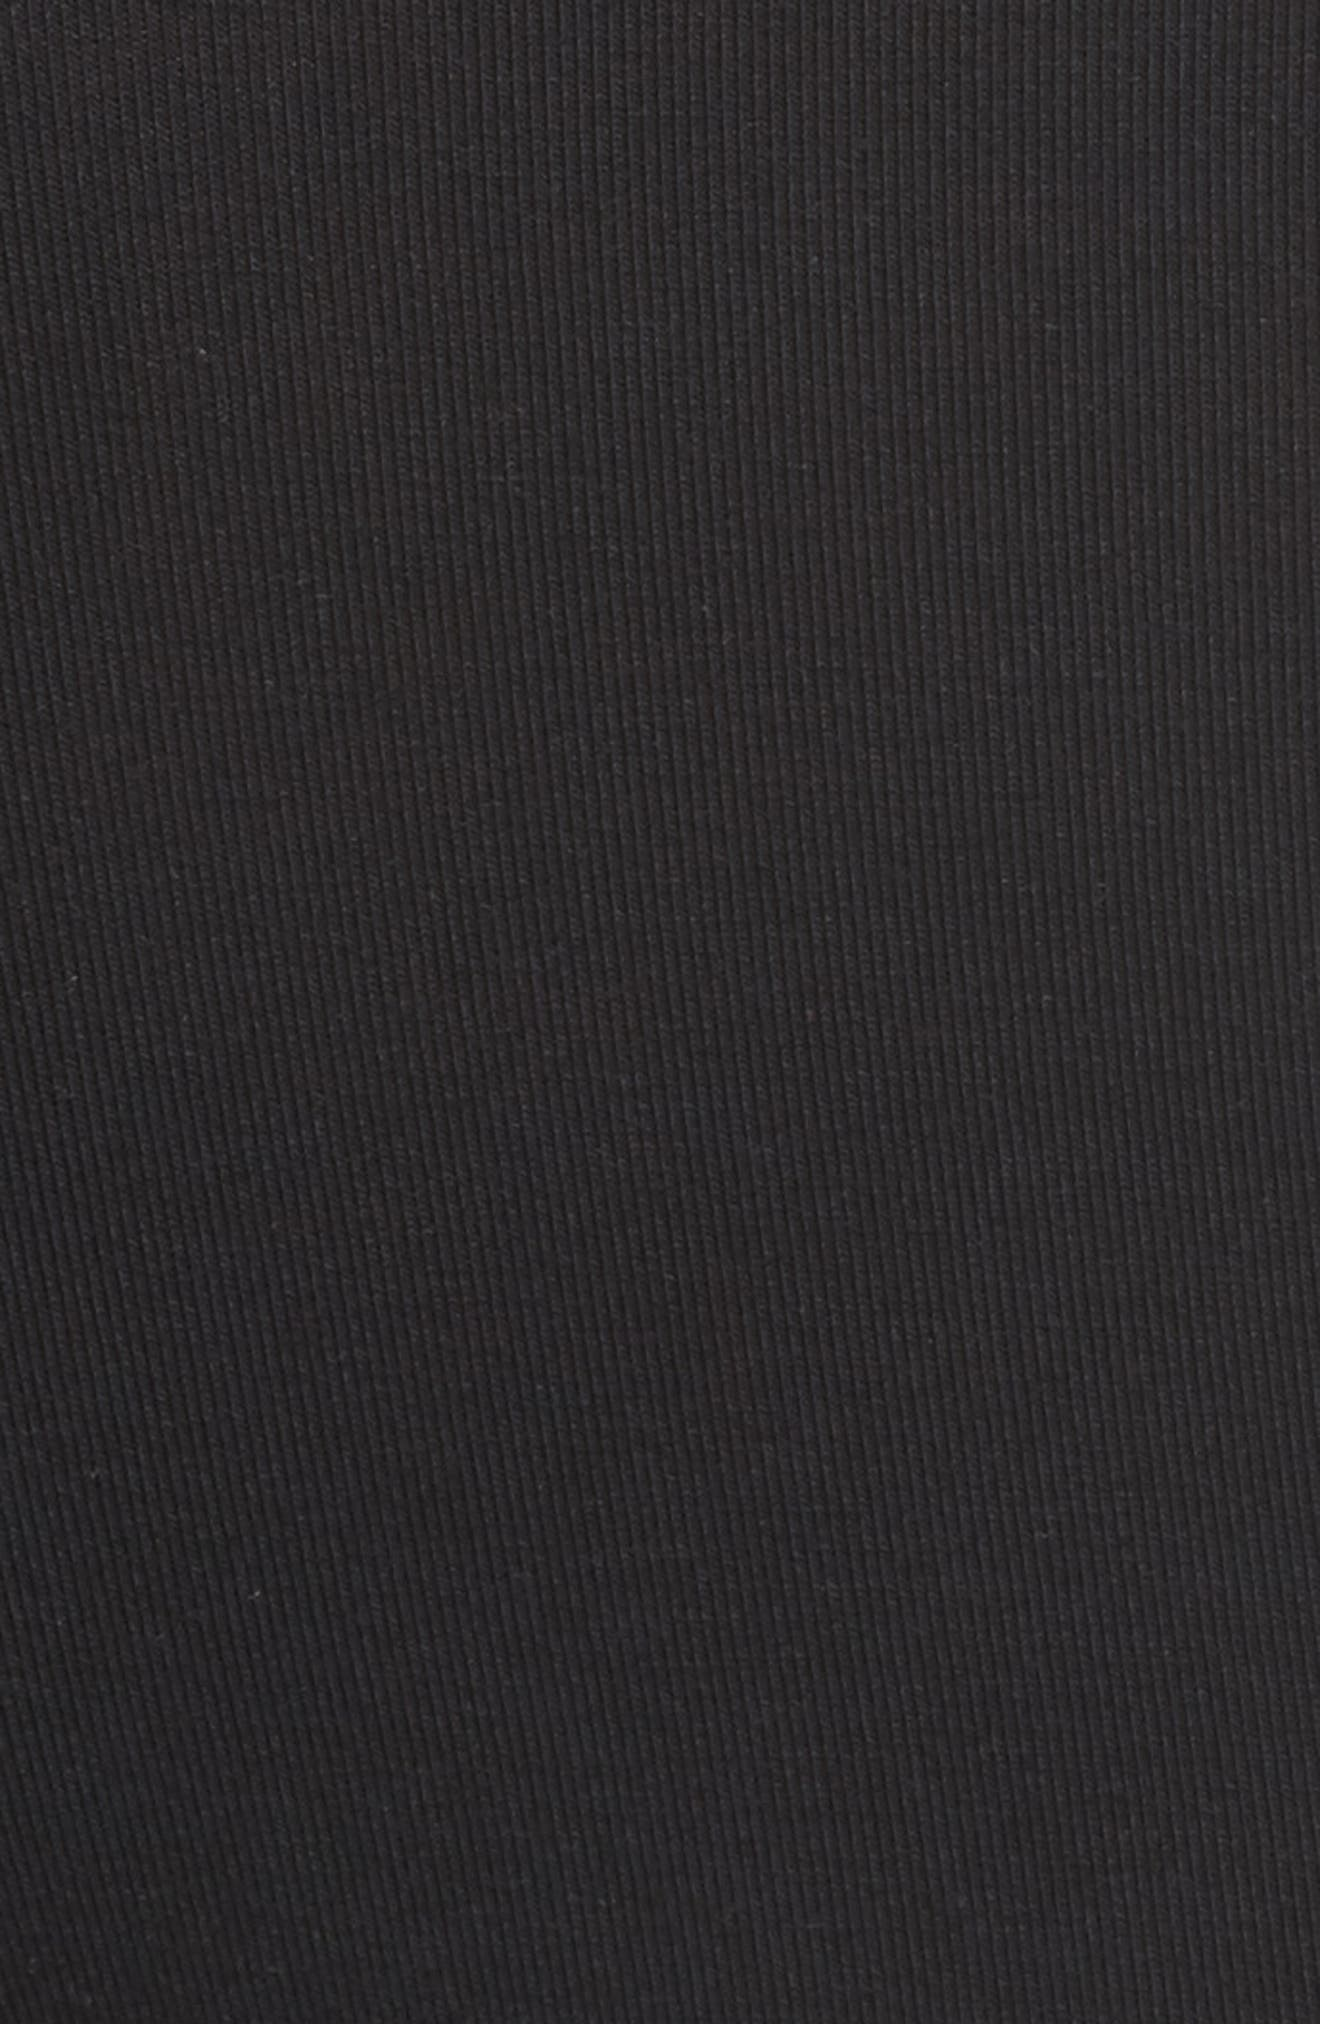 Sportswear Women's Leggings,                             Alternate thumbnail 8, color,                             BLACK/ BLACK/ BLACK